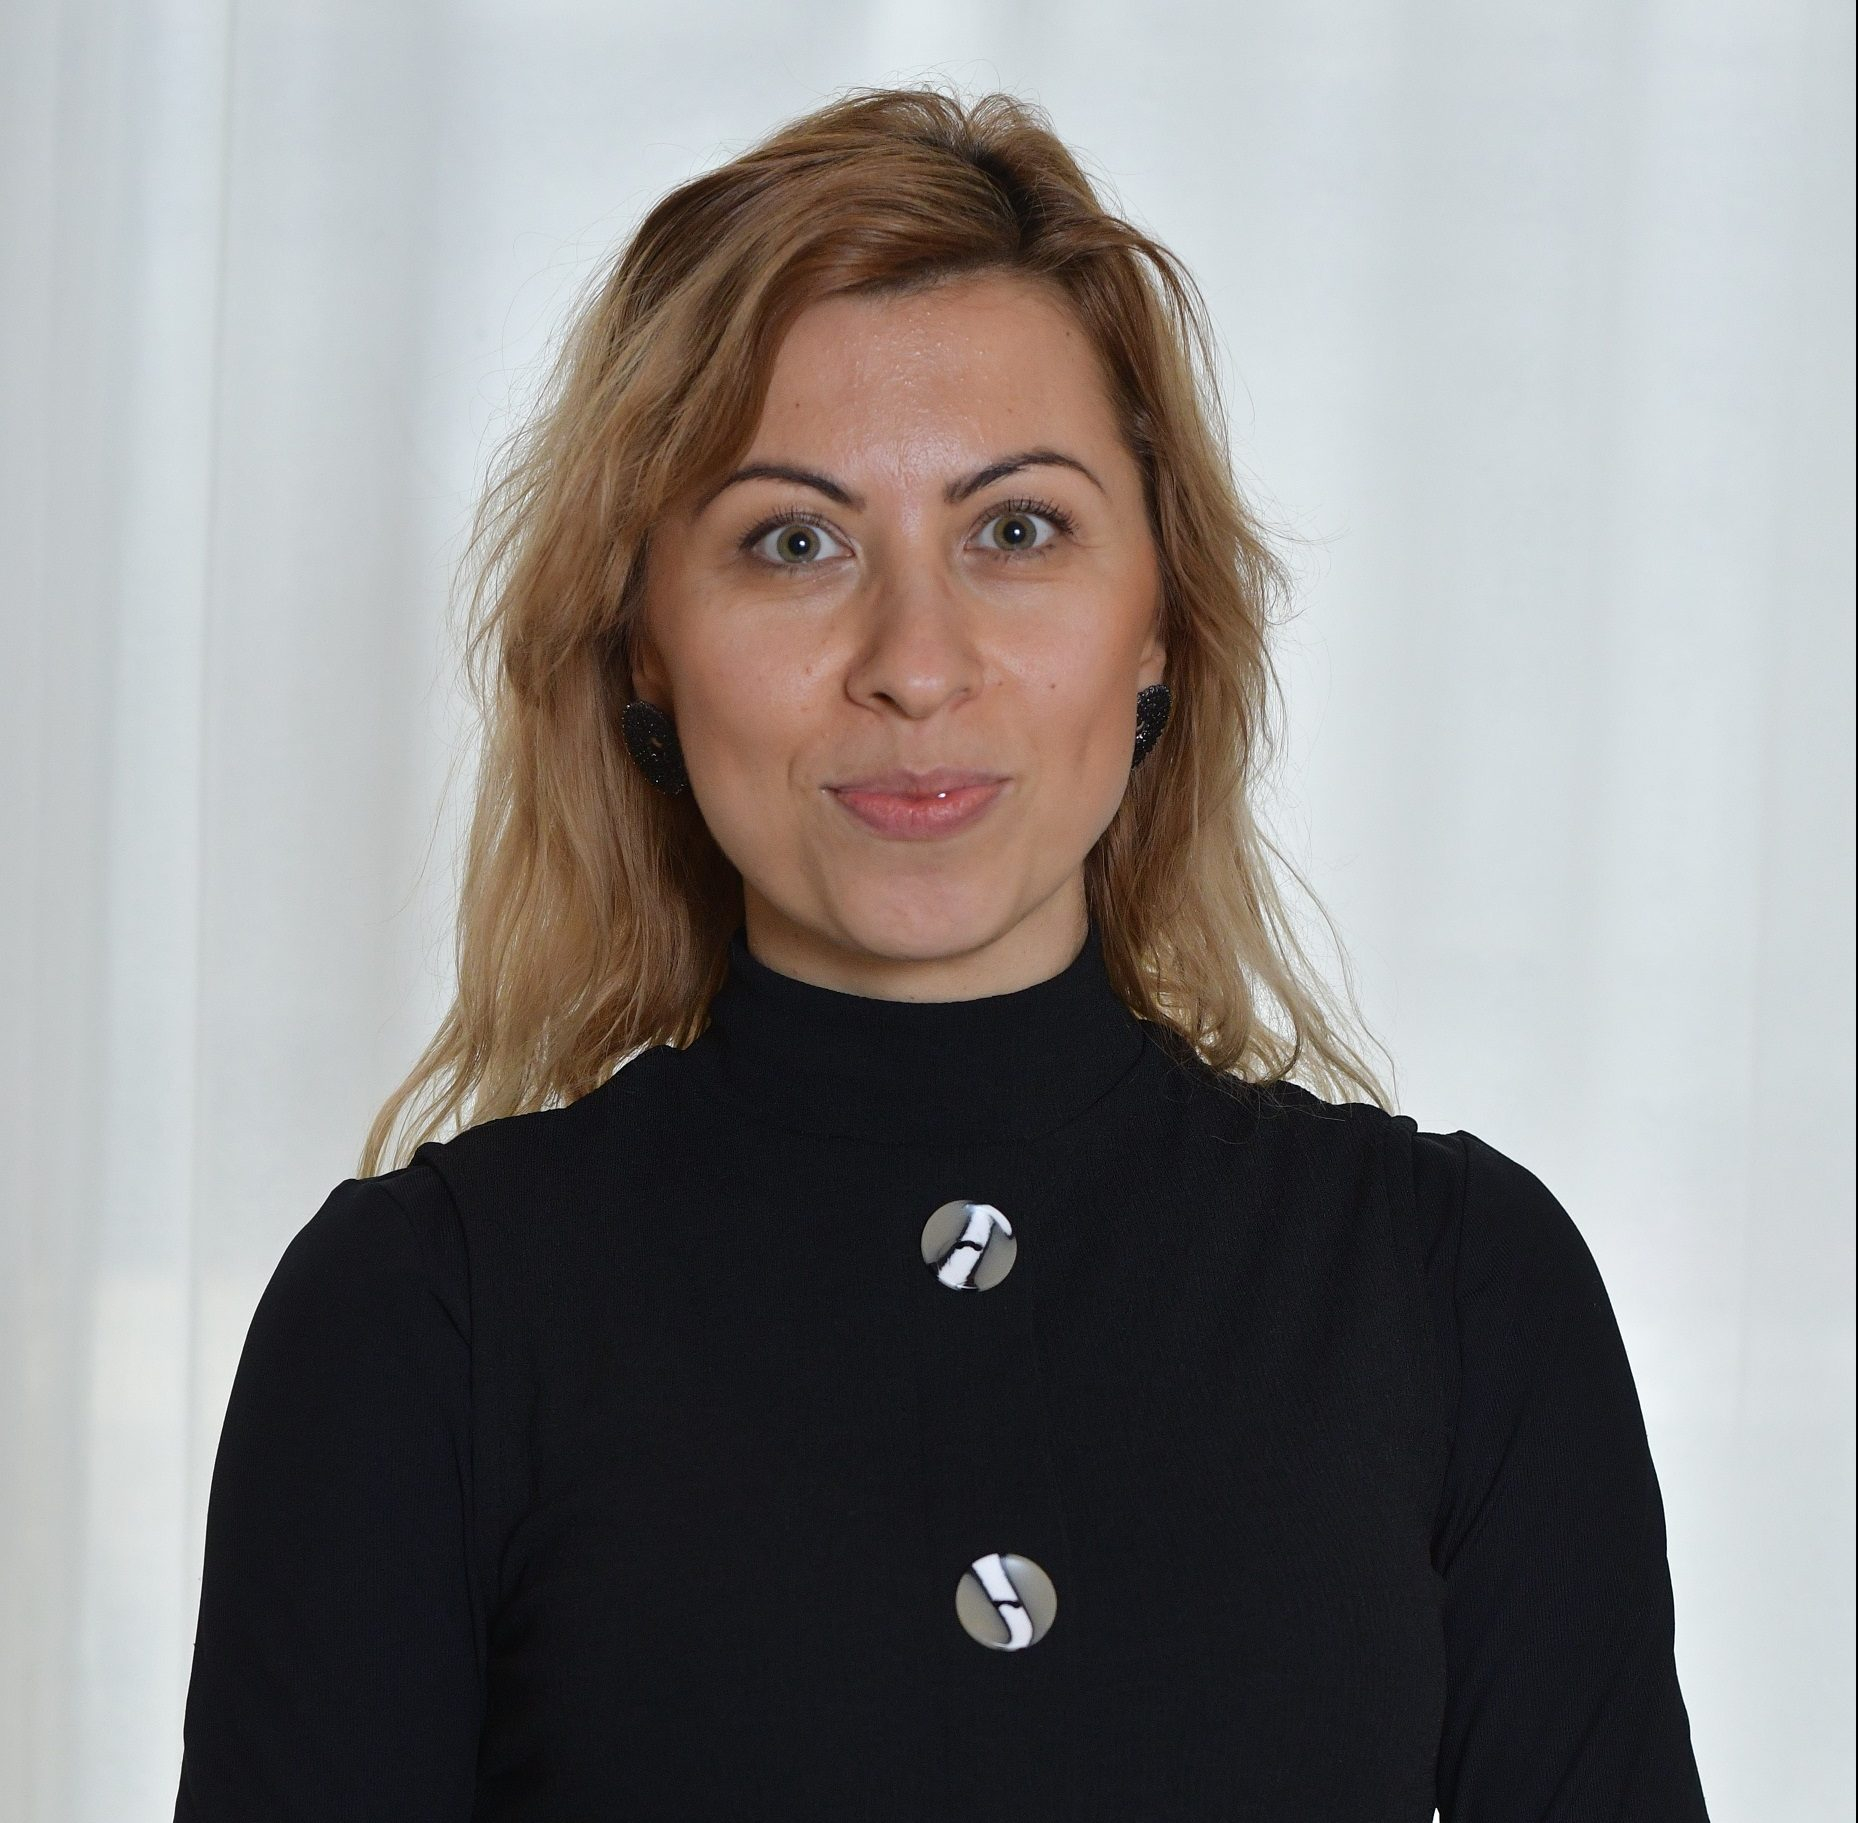 Veronica Balogh